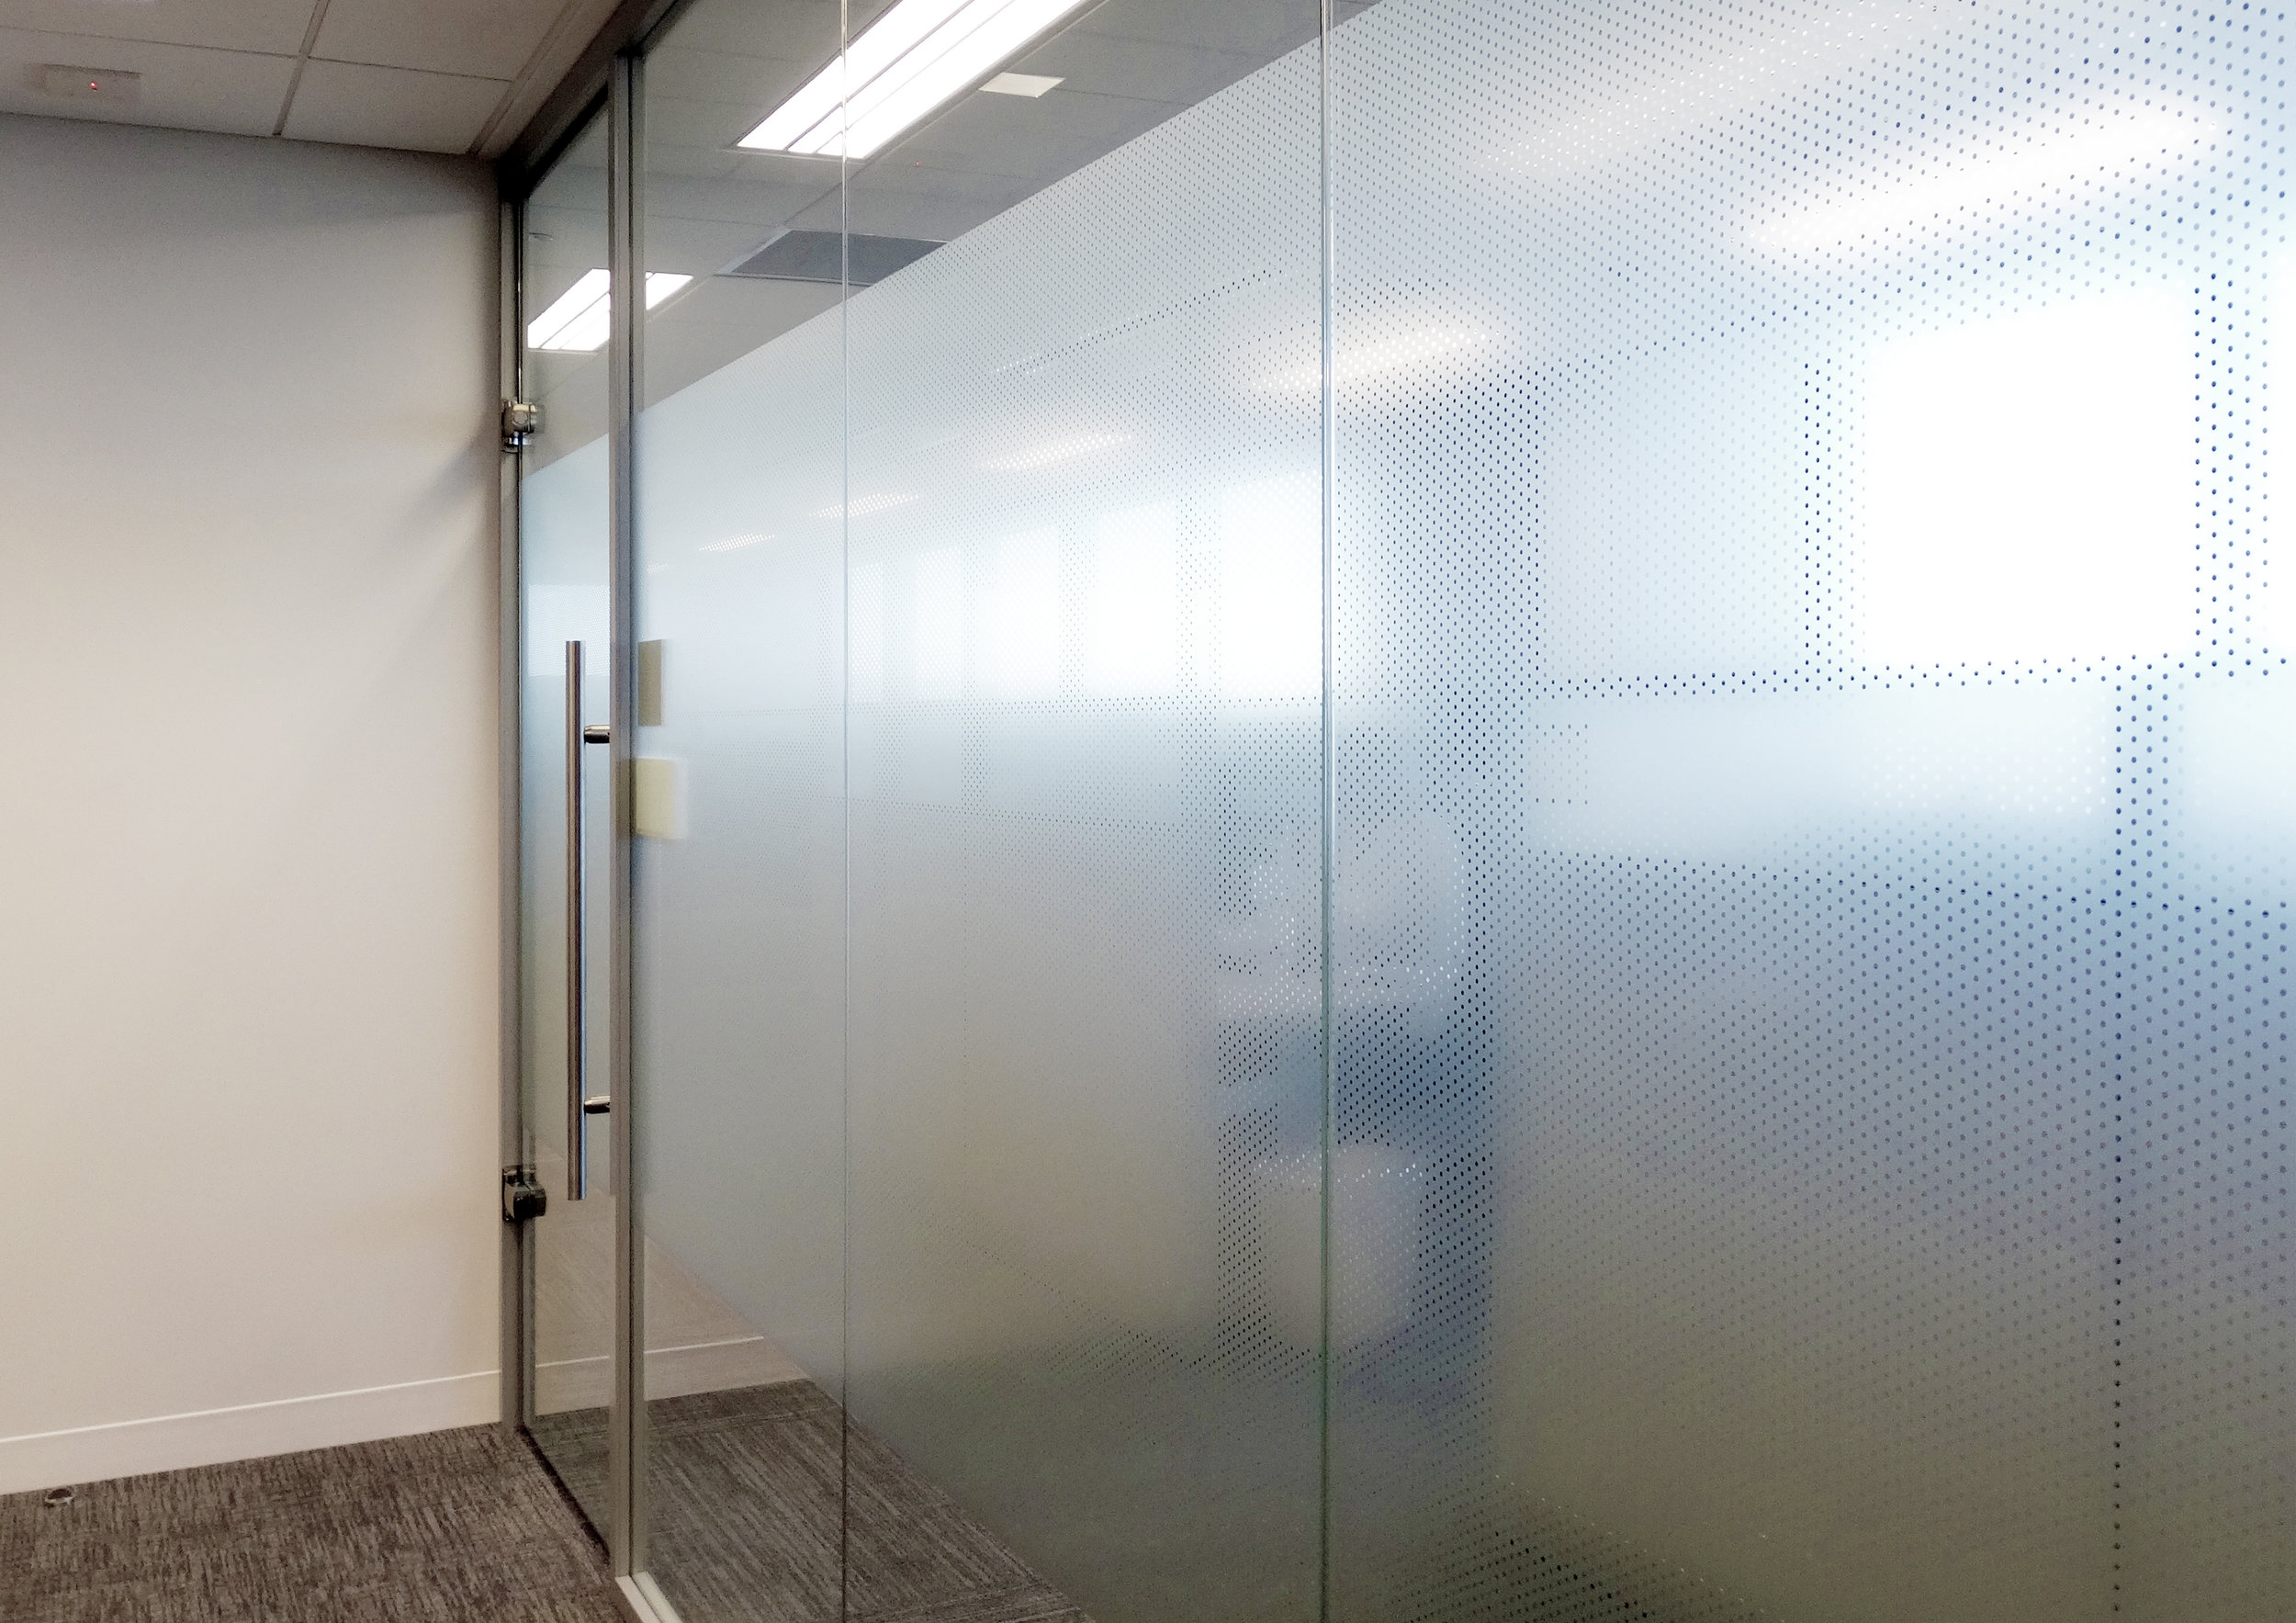 Litespace Aluminum Framed Glass System - Spaceworks AI.jpg